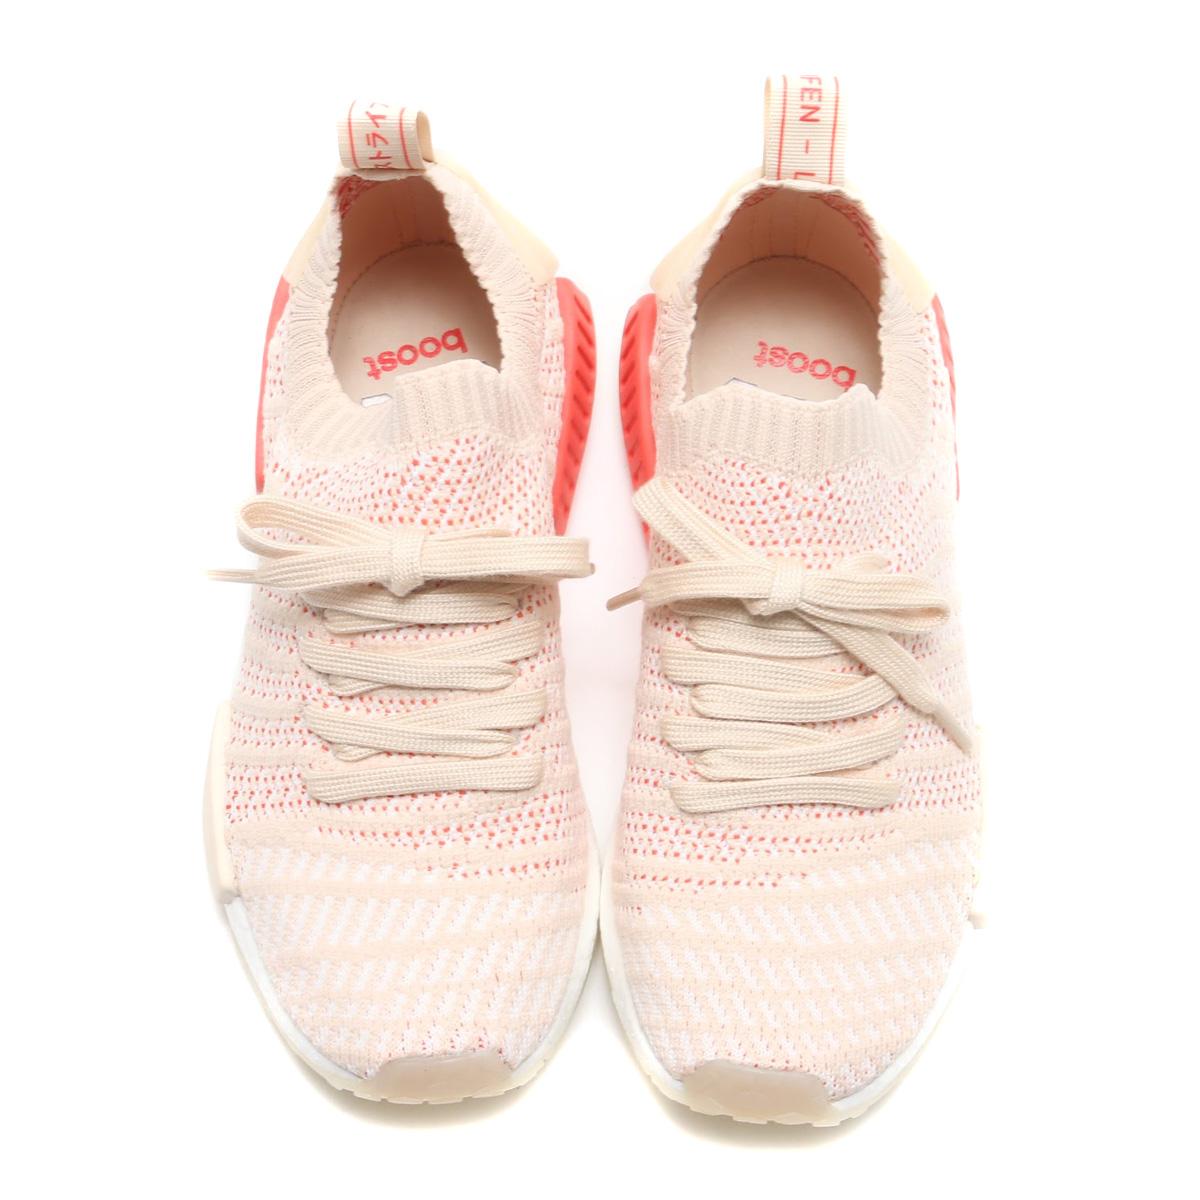 uk availability a0a04 c3d47 ... adidas Originals NMD R1 STLT PK W (Adidas originals N M D R1 STLT PK W)  Linen ...